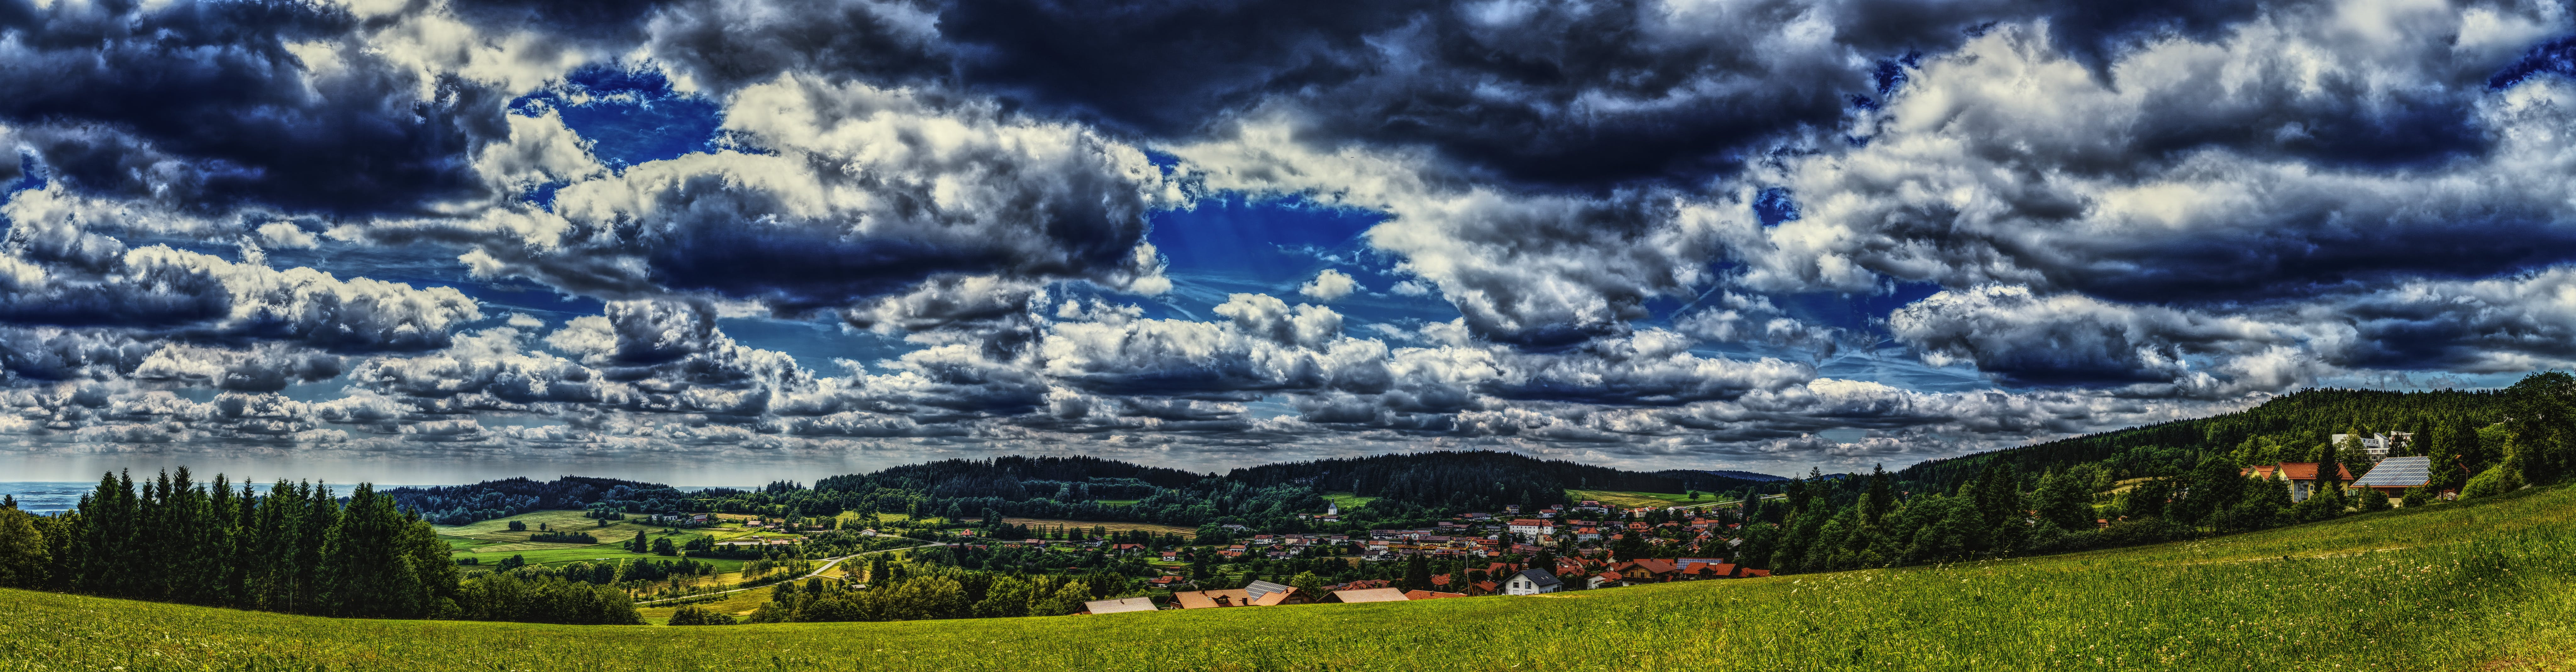 Fotos de stock gratuitas de Baviera, campo, cielo, colina